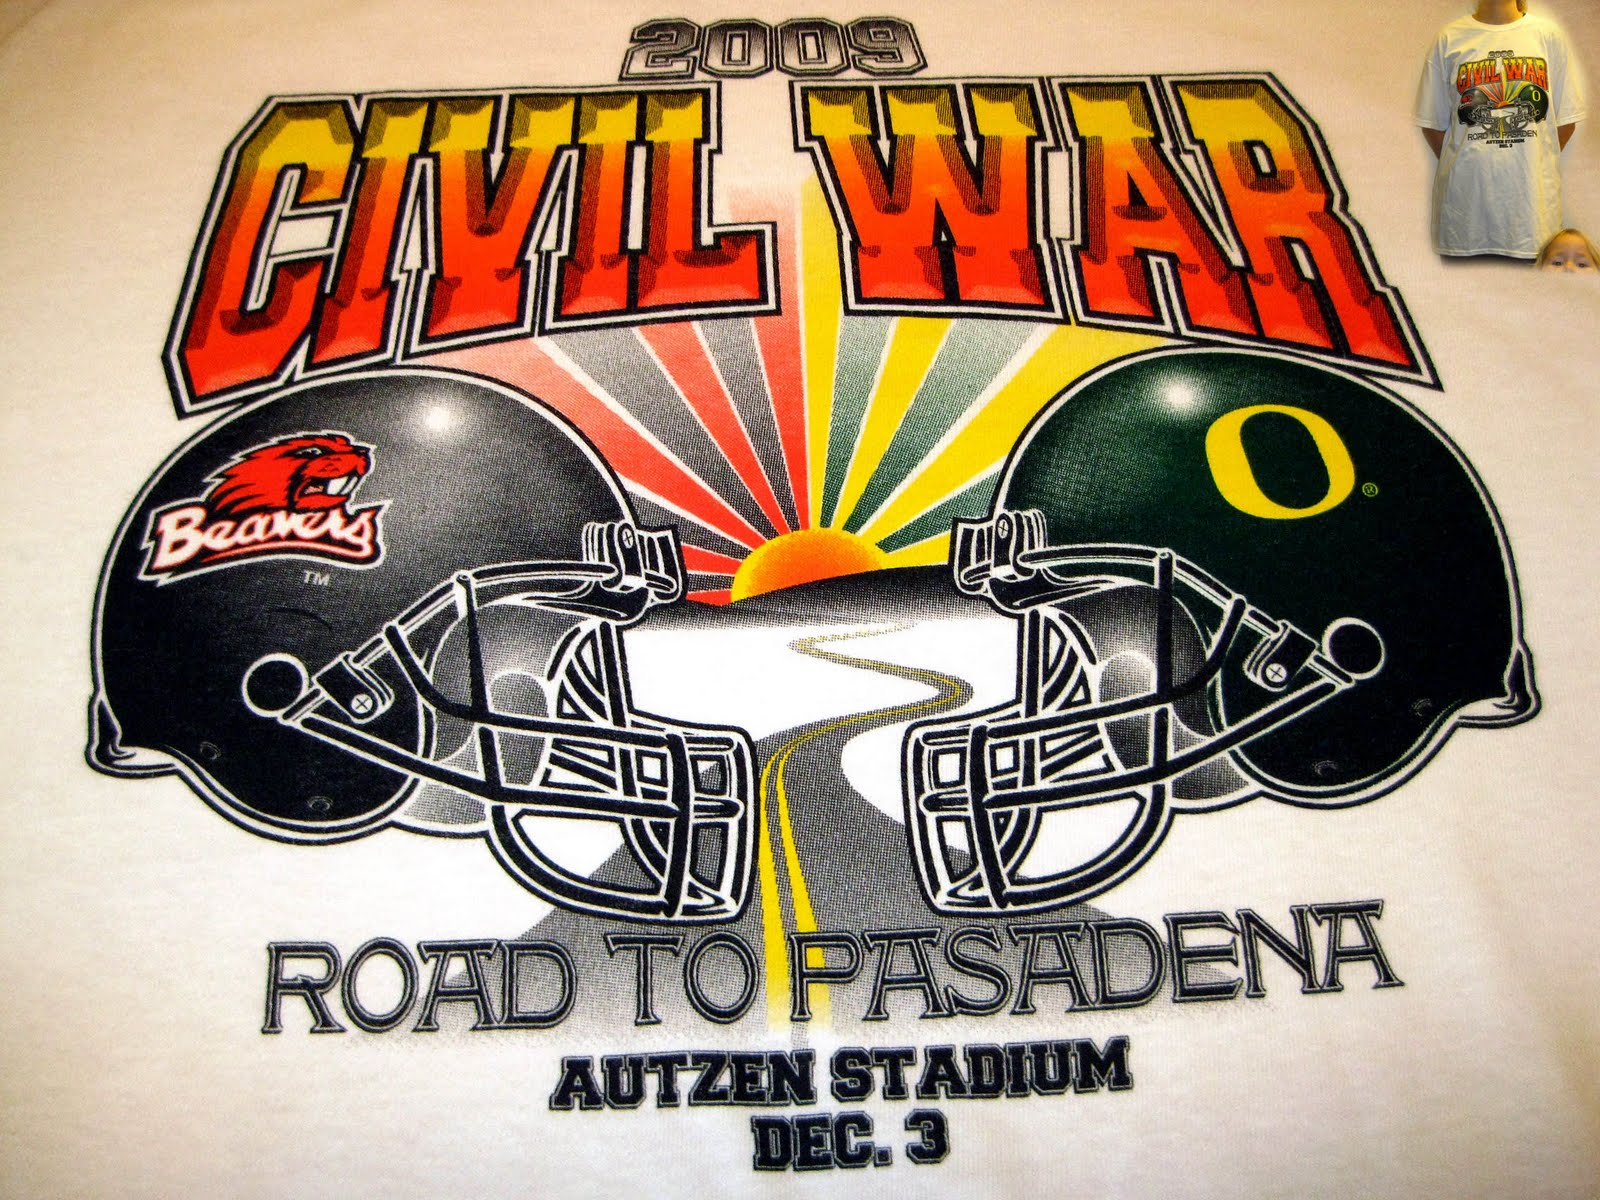 https://i2.wp.com/4.bp.blogspot.com/_DOF4LiEatkg/Swtr7QaZ8LI/AAAAAAAAAQk/tLq3OpB9BVI/s1600/ducks-vs-beavers-civil-war-.jpg